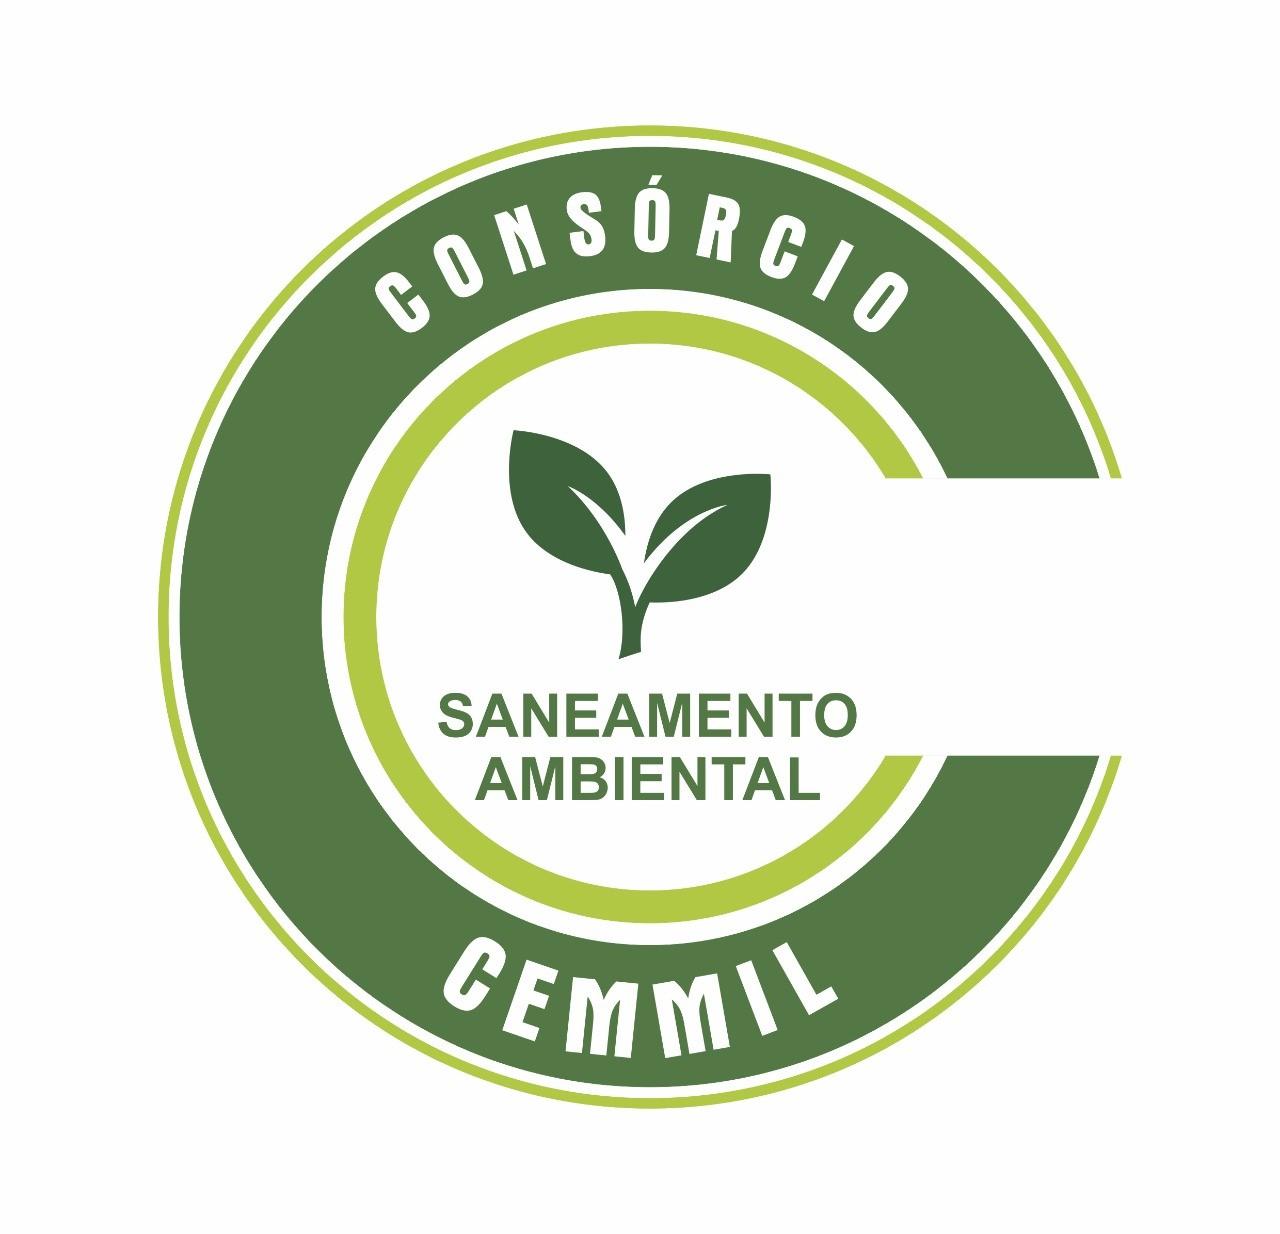 Logo da entidade CONSÓRCIO INTERMUNICIPAL CEMMIL – SANEAMENTO AMBIENTAL